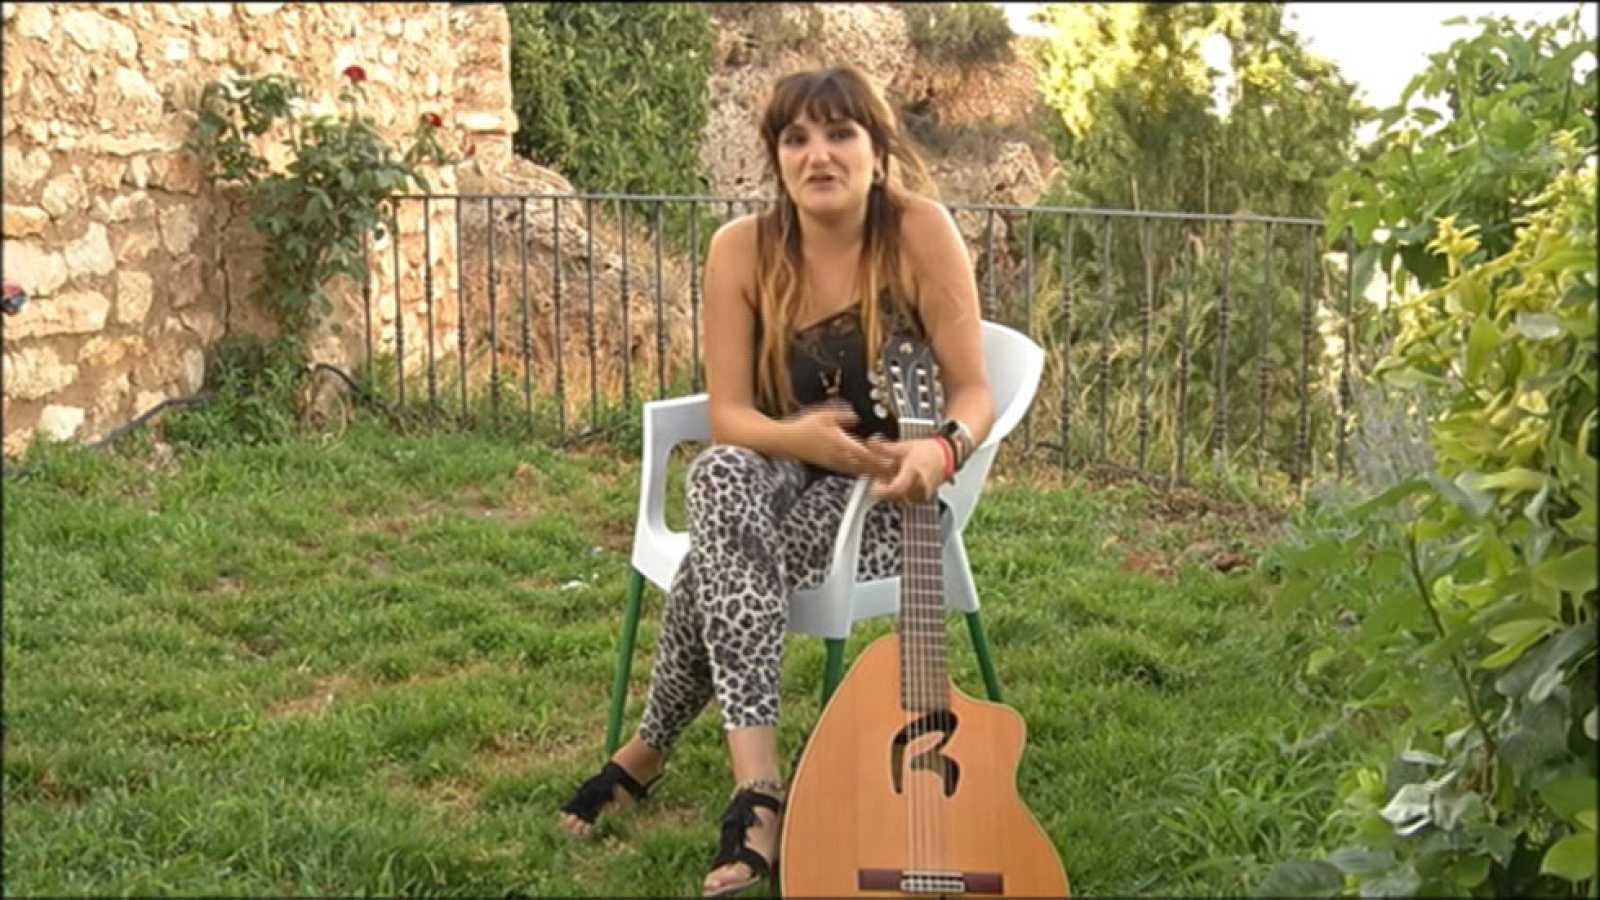 La cantante Rozalen promueve el festival LeturAlma